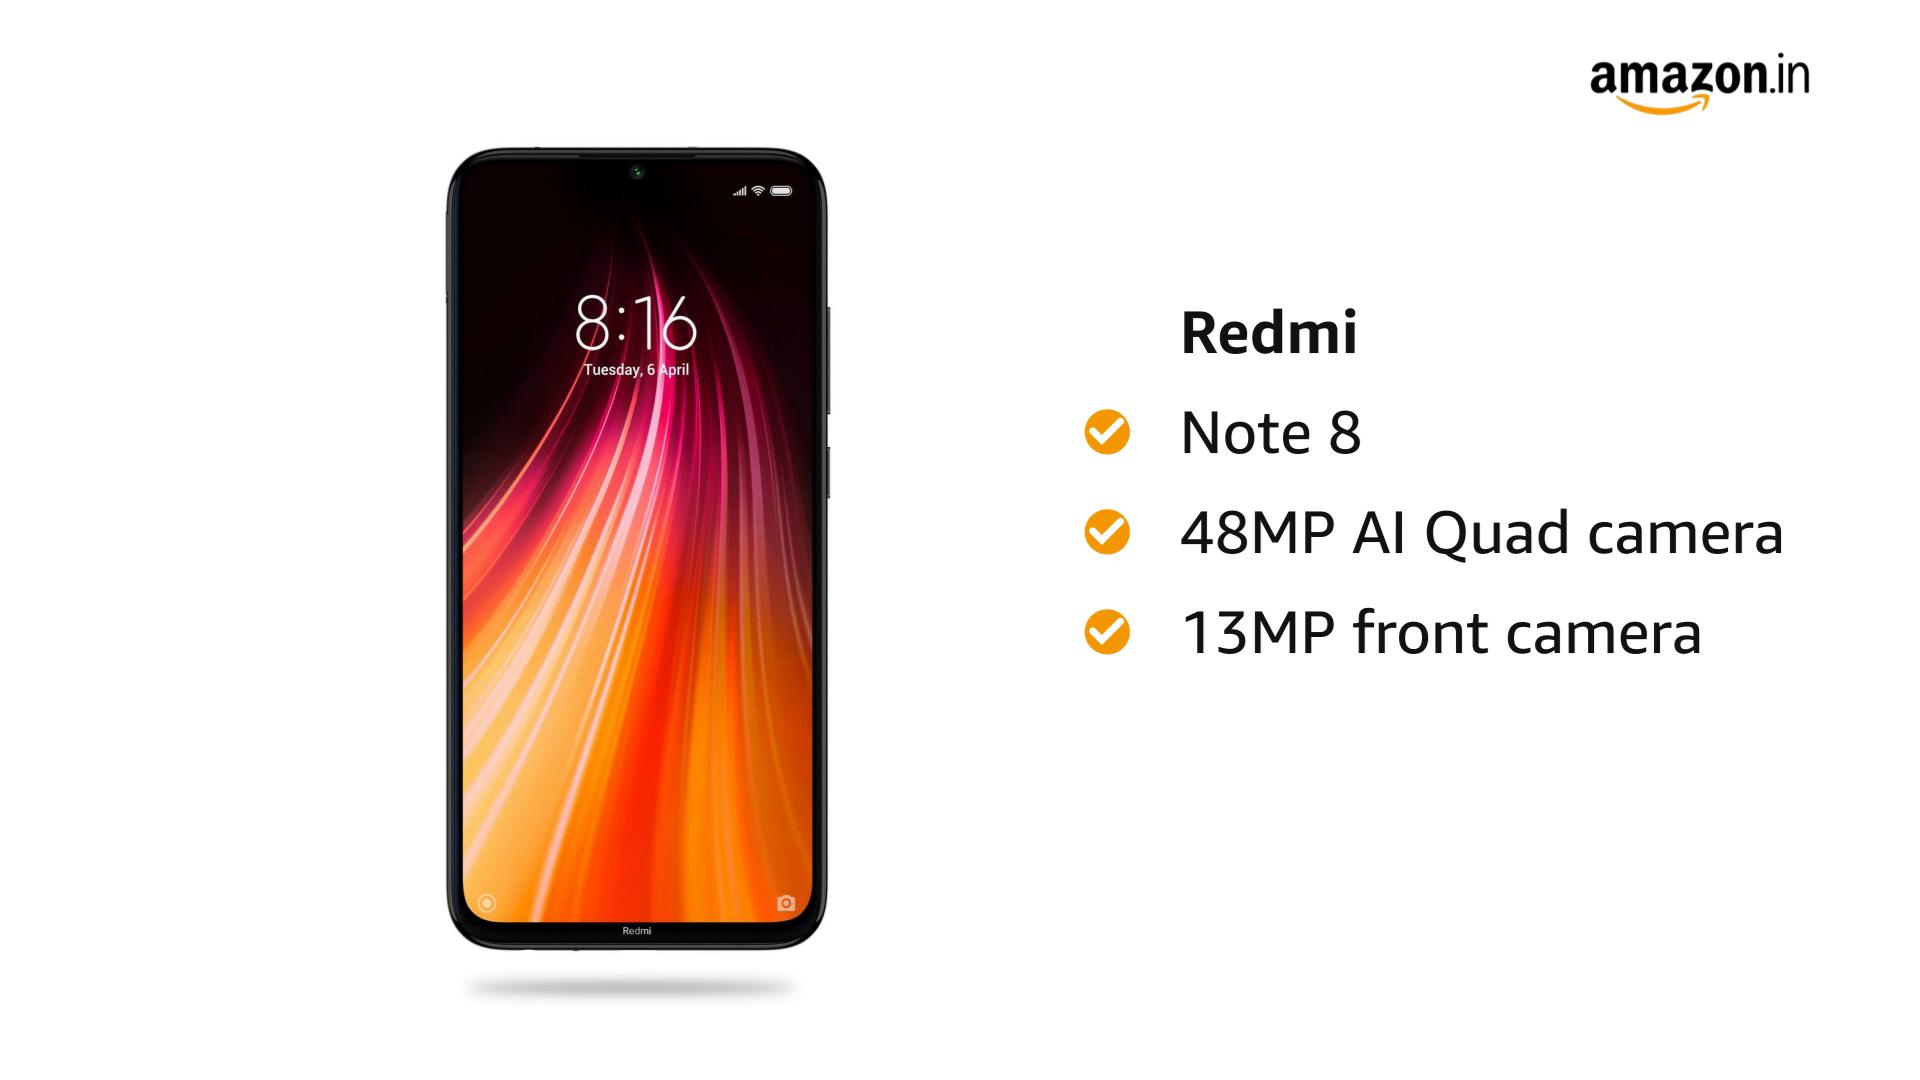 Redmi Note 8 (Neptune Blue, 4GB RAM, 64GB Storage)